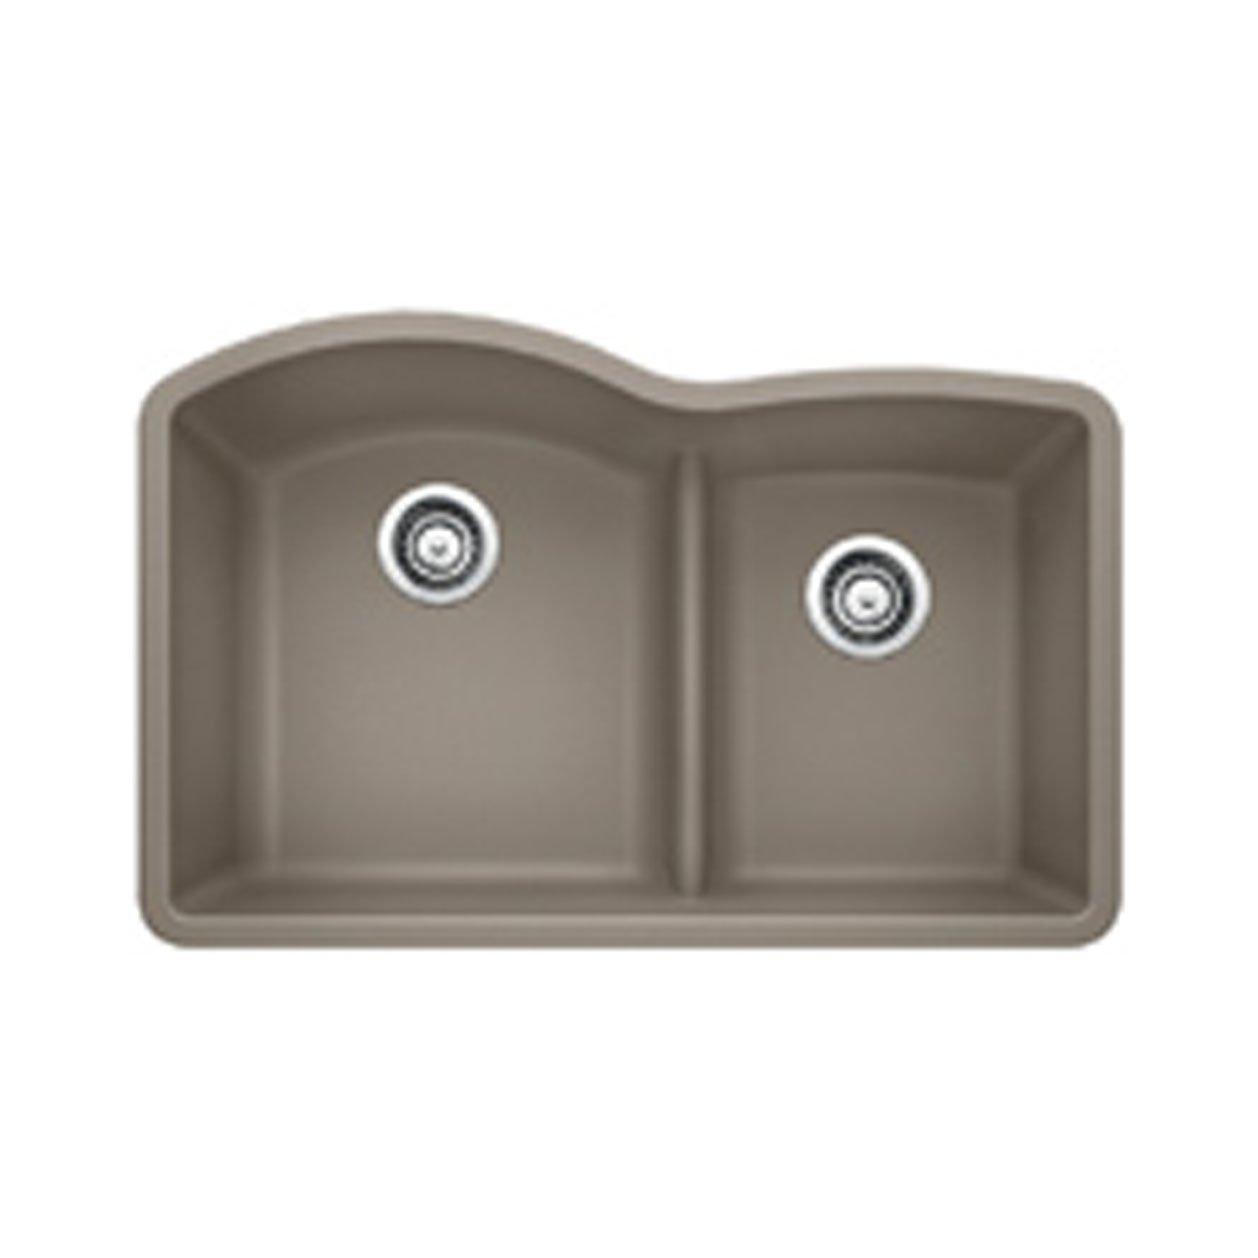 Blanco 441596 Diamond 1.75 Low Divide Under Mount Double Bowl Kitchen Sink,  Large, Truffle     Amazon.com